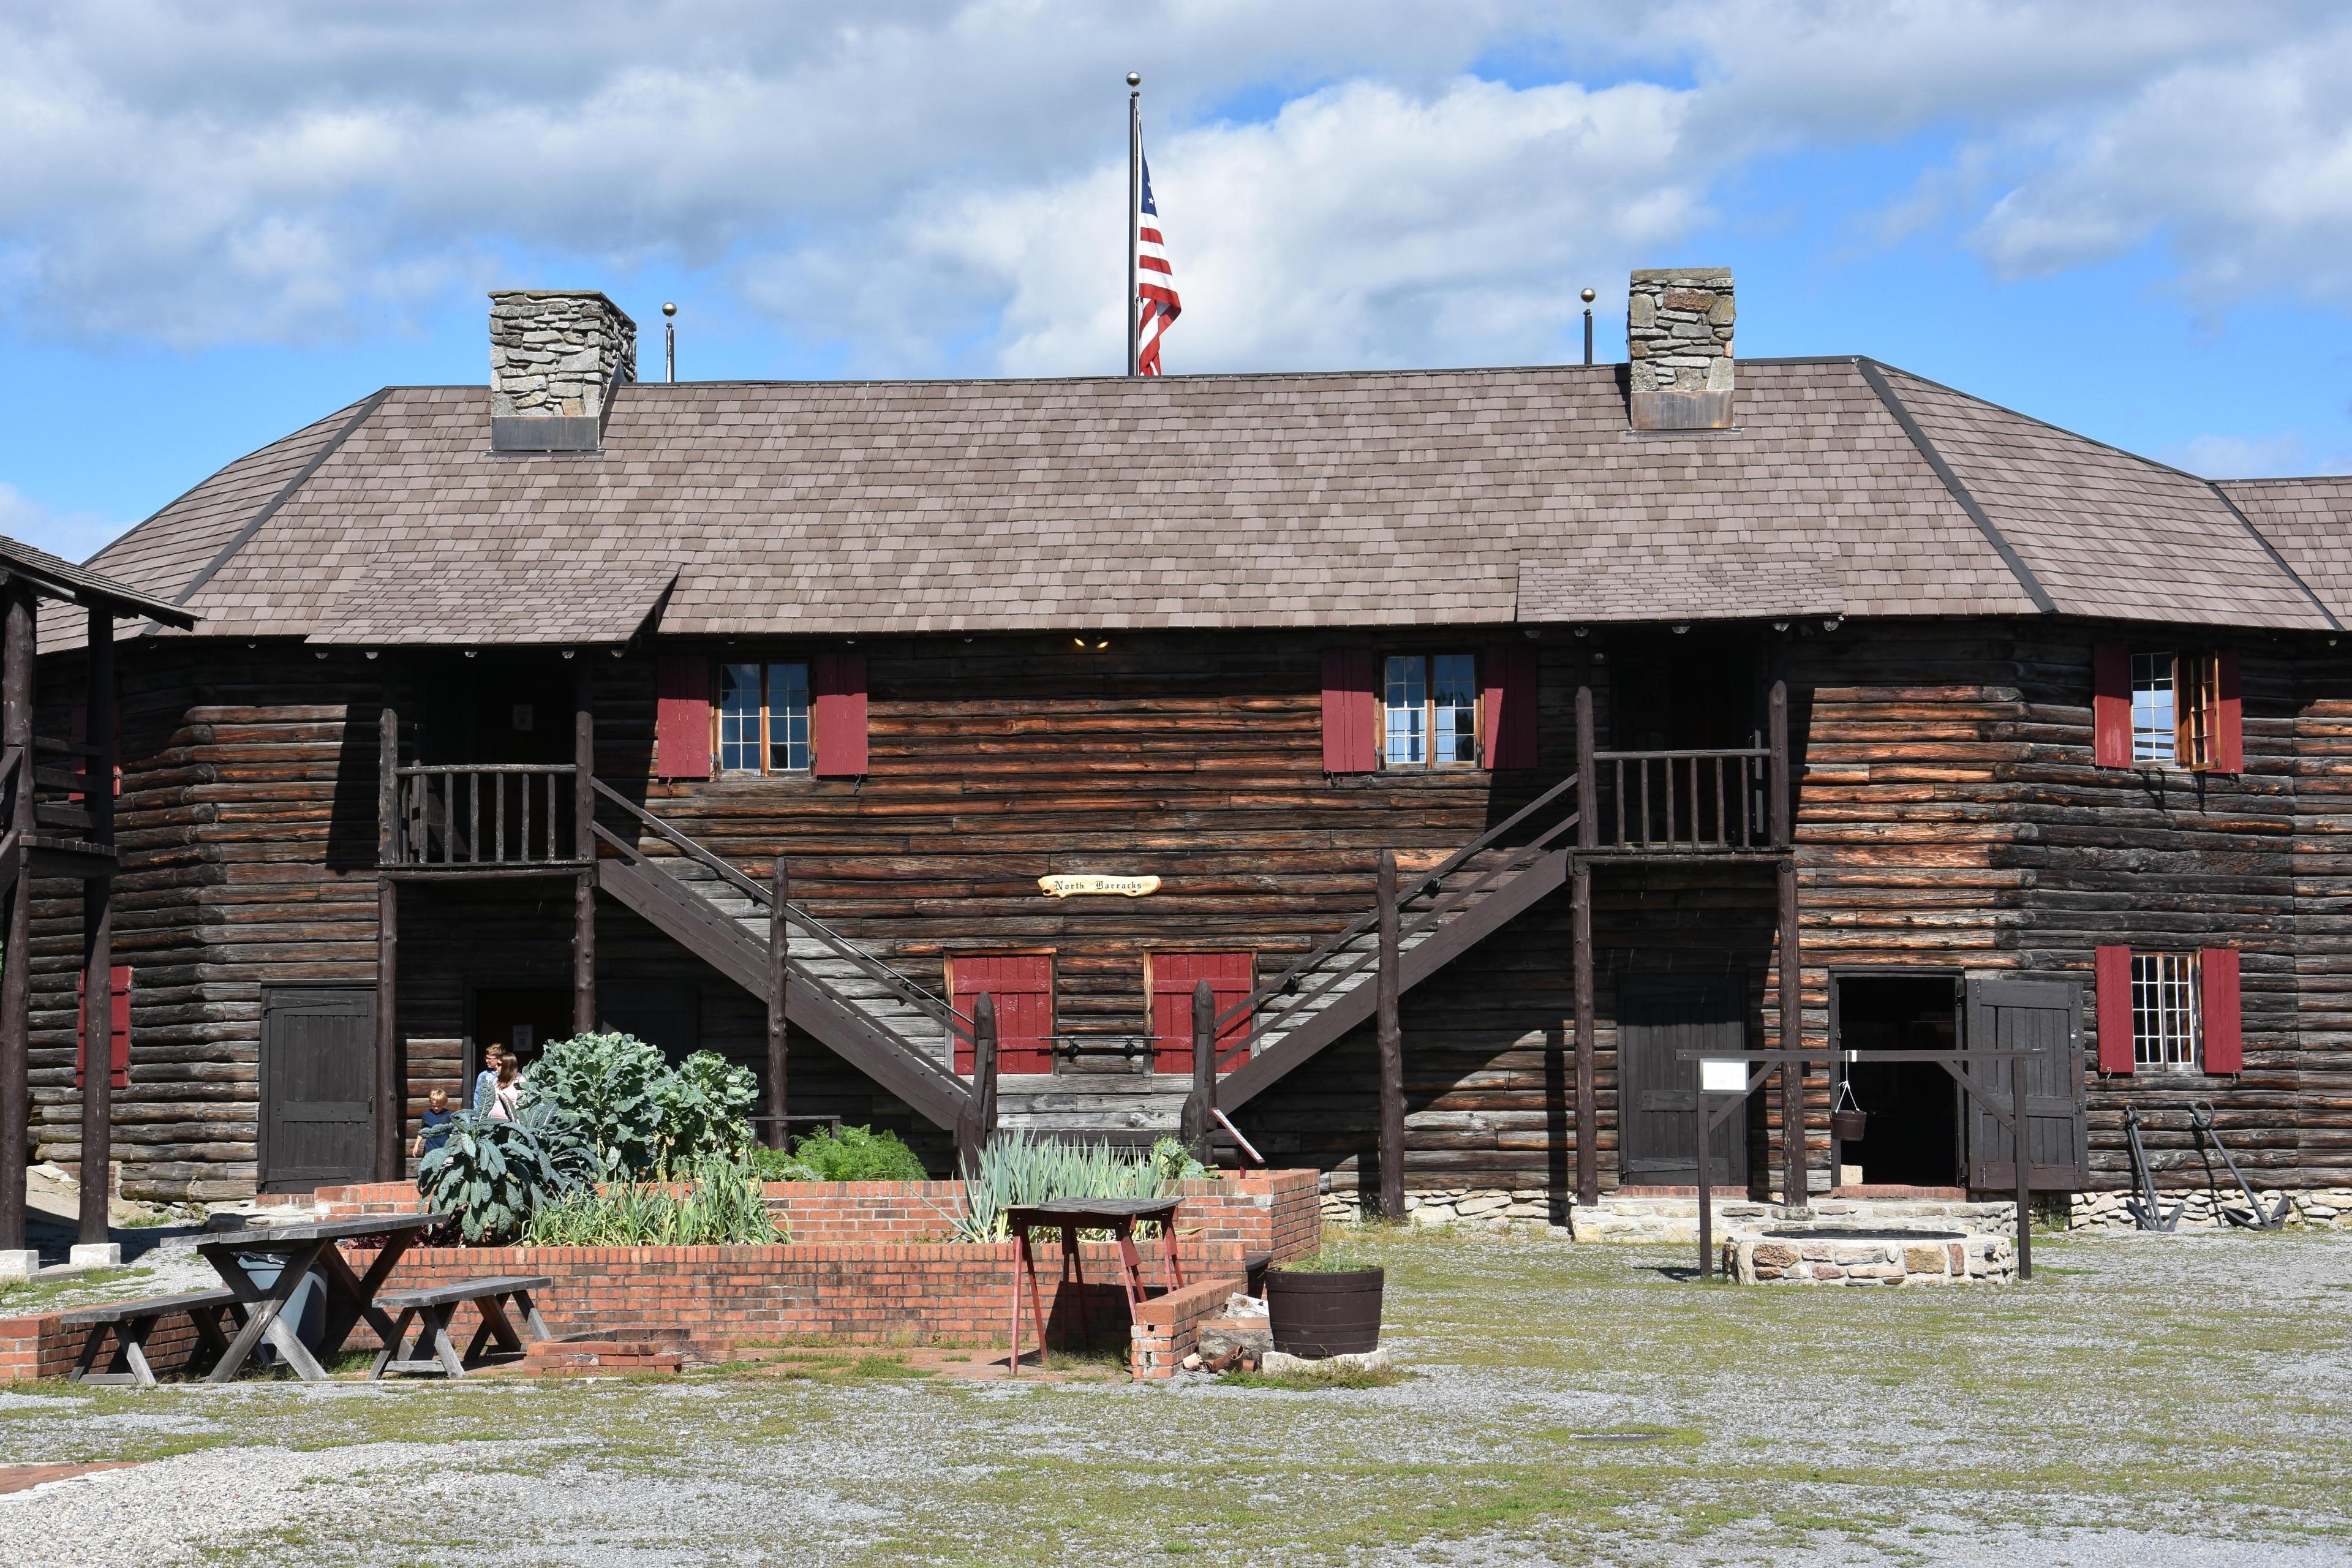 Fort William Henry, Lake George, New York, USA